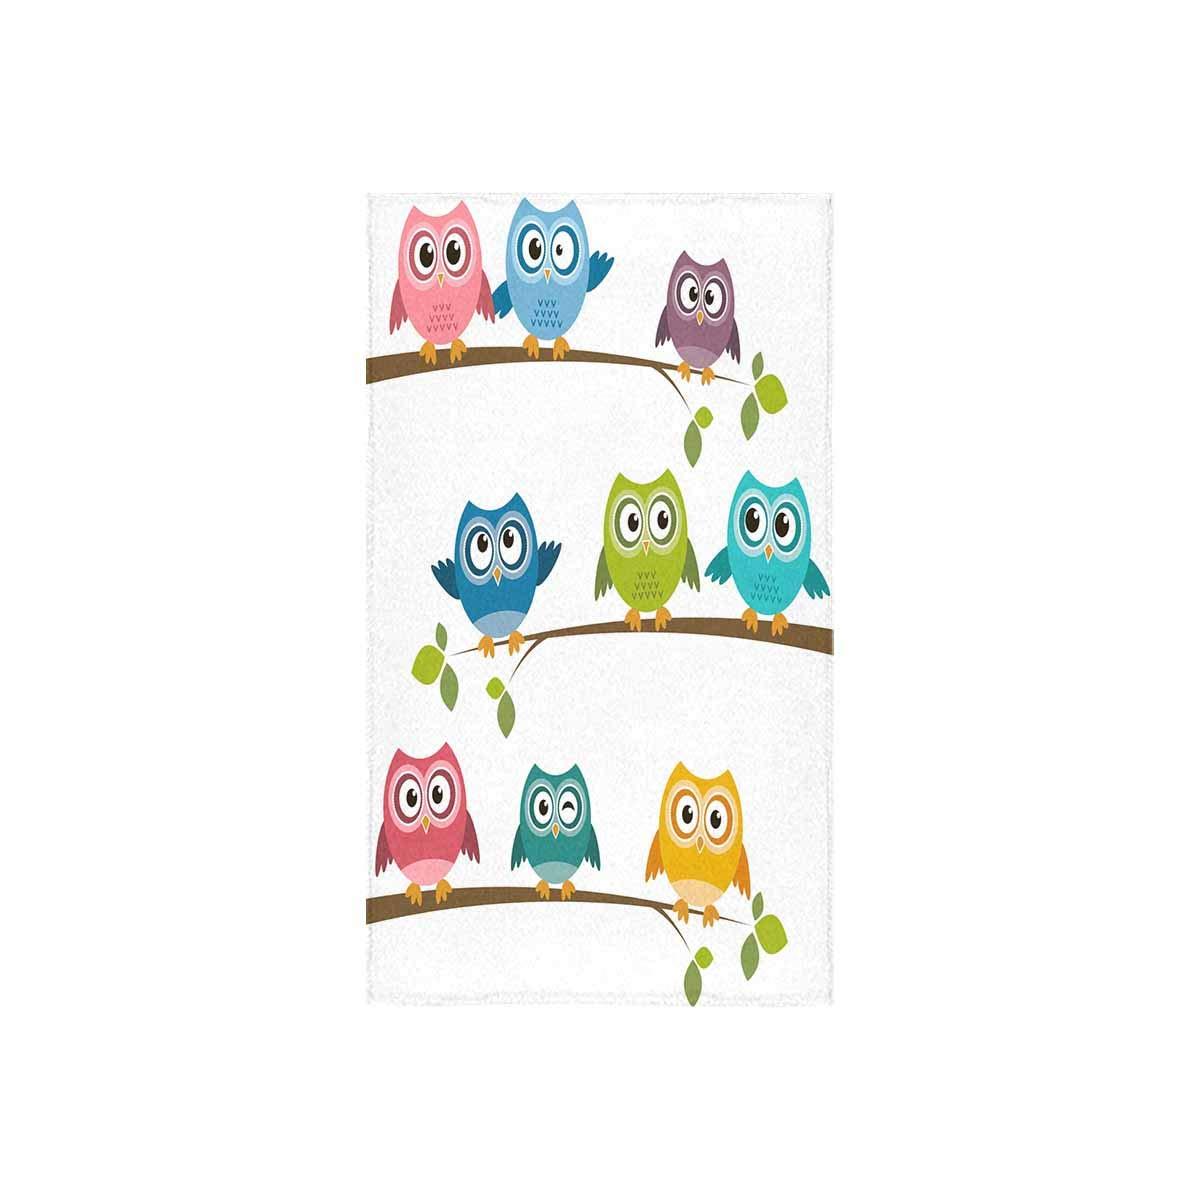 InterestPrint Cartoon Owls Bathroom Hand Towels 16 x 28 inches Bath Towels Home Travel Use